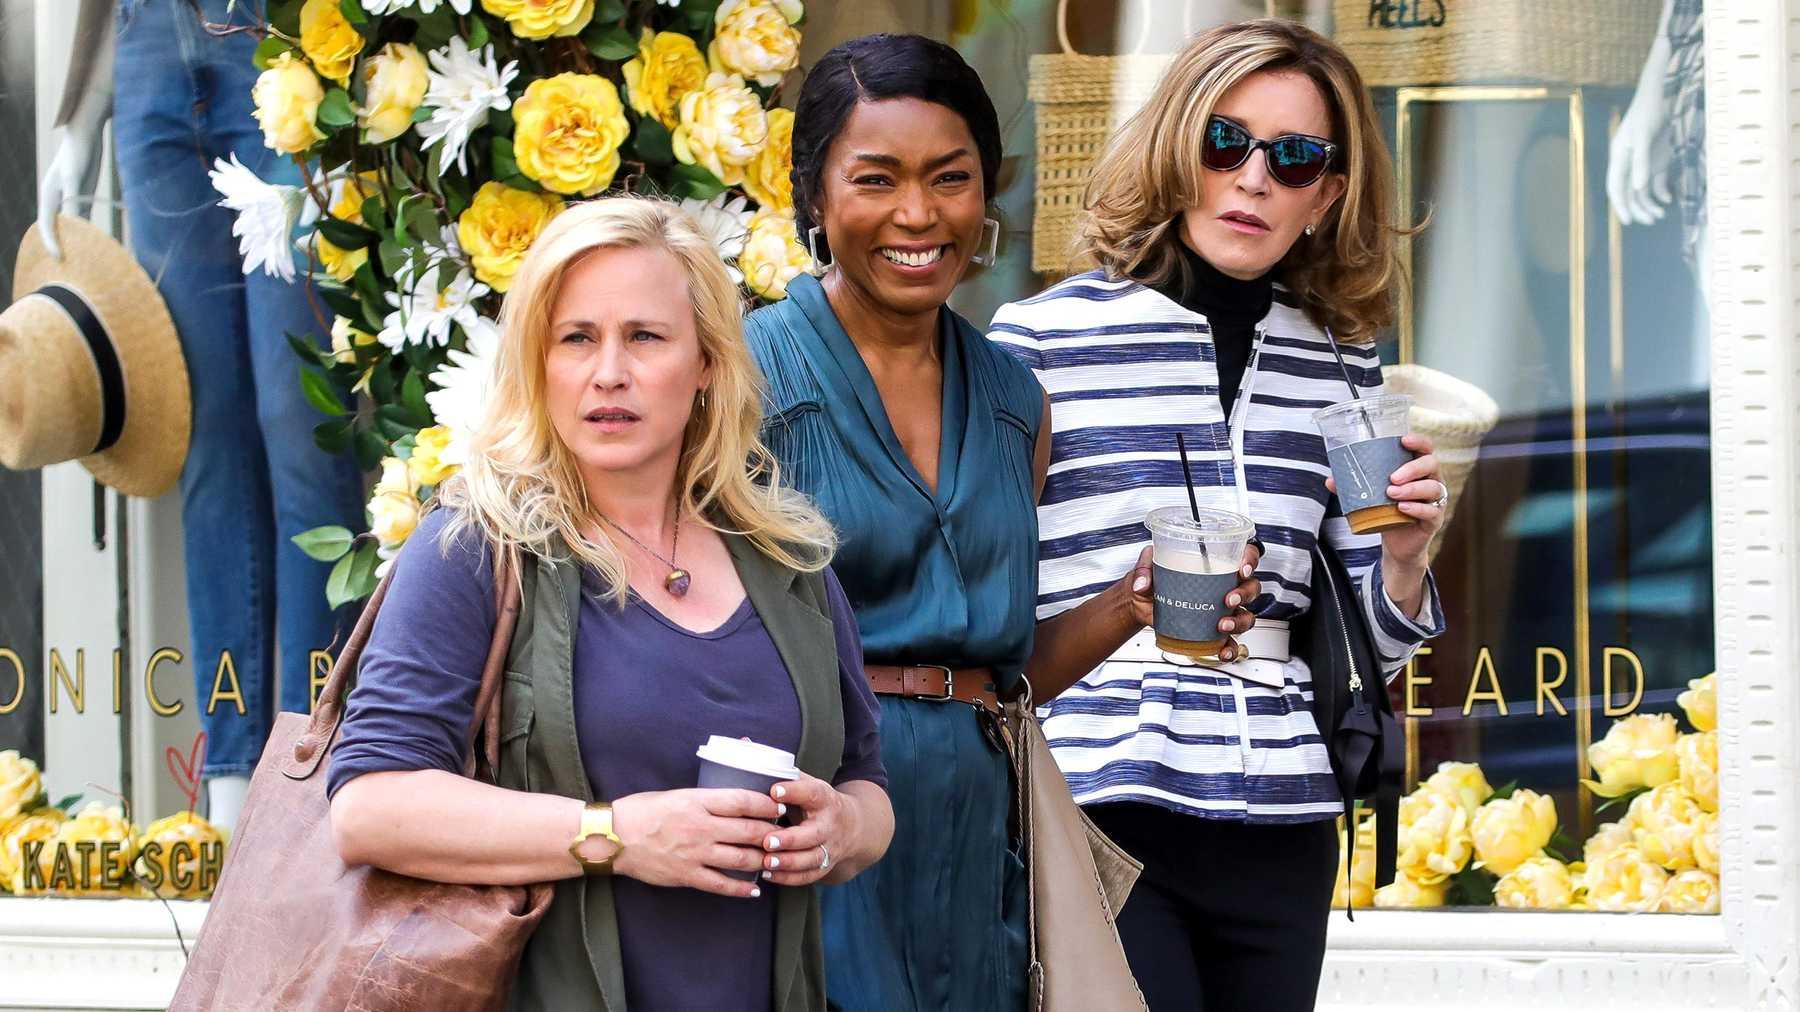 What Netflix did next: women over 30, having fun!